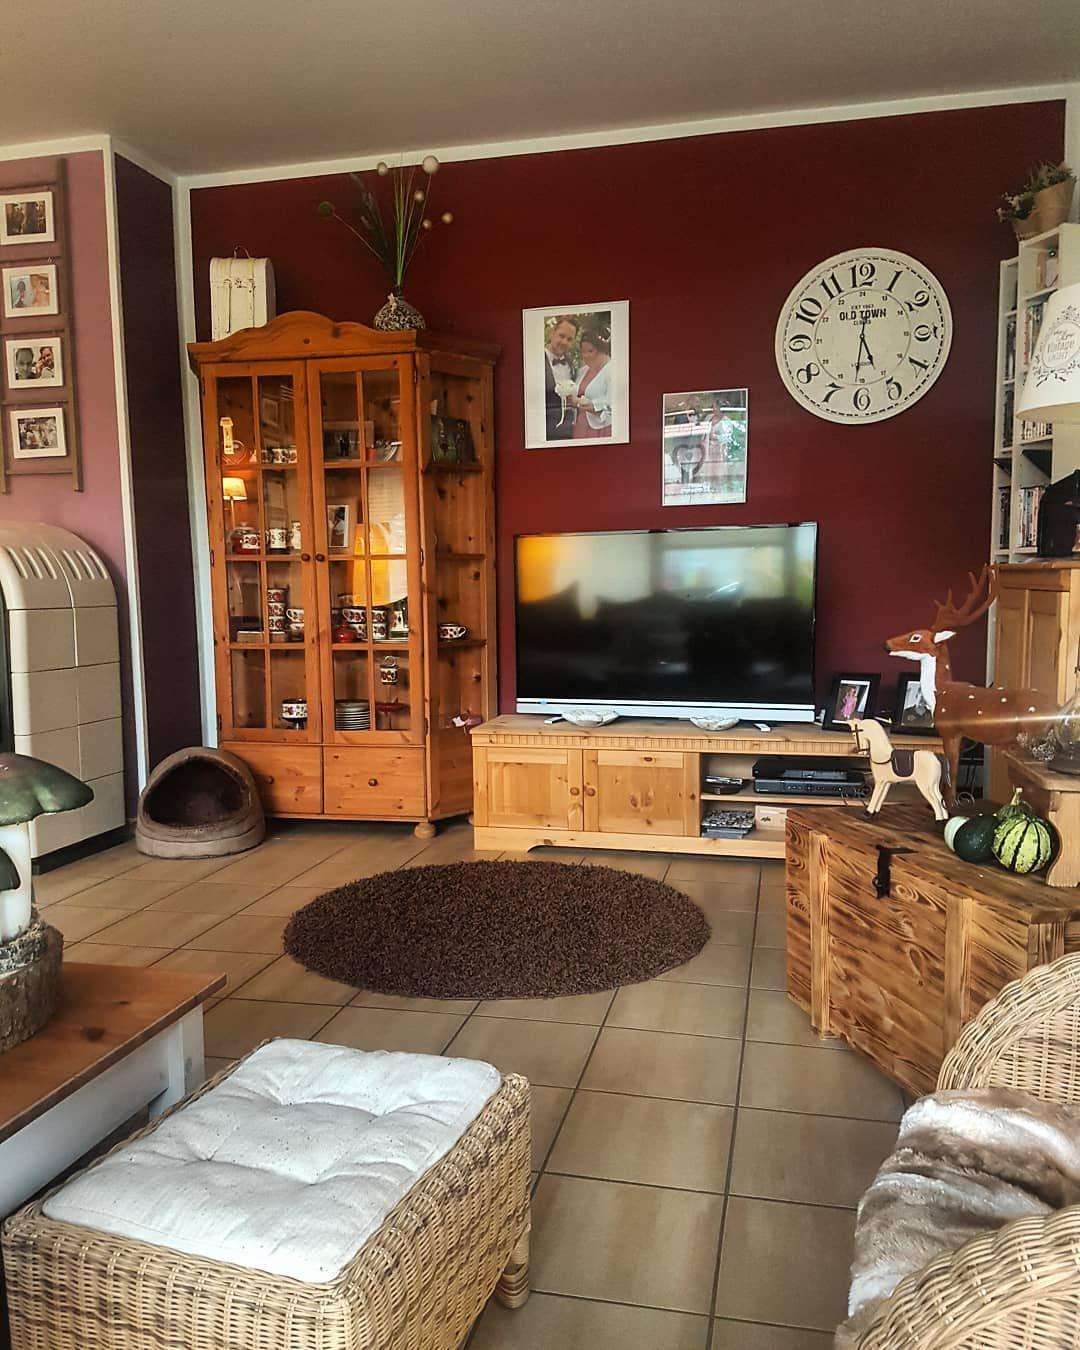 wohnzimmer #kiefernmöbel #echtholzmöbel #countryhome #cozyhome